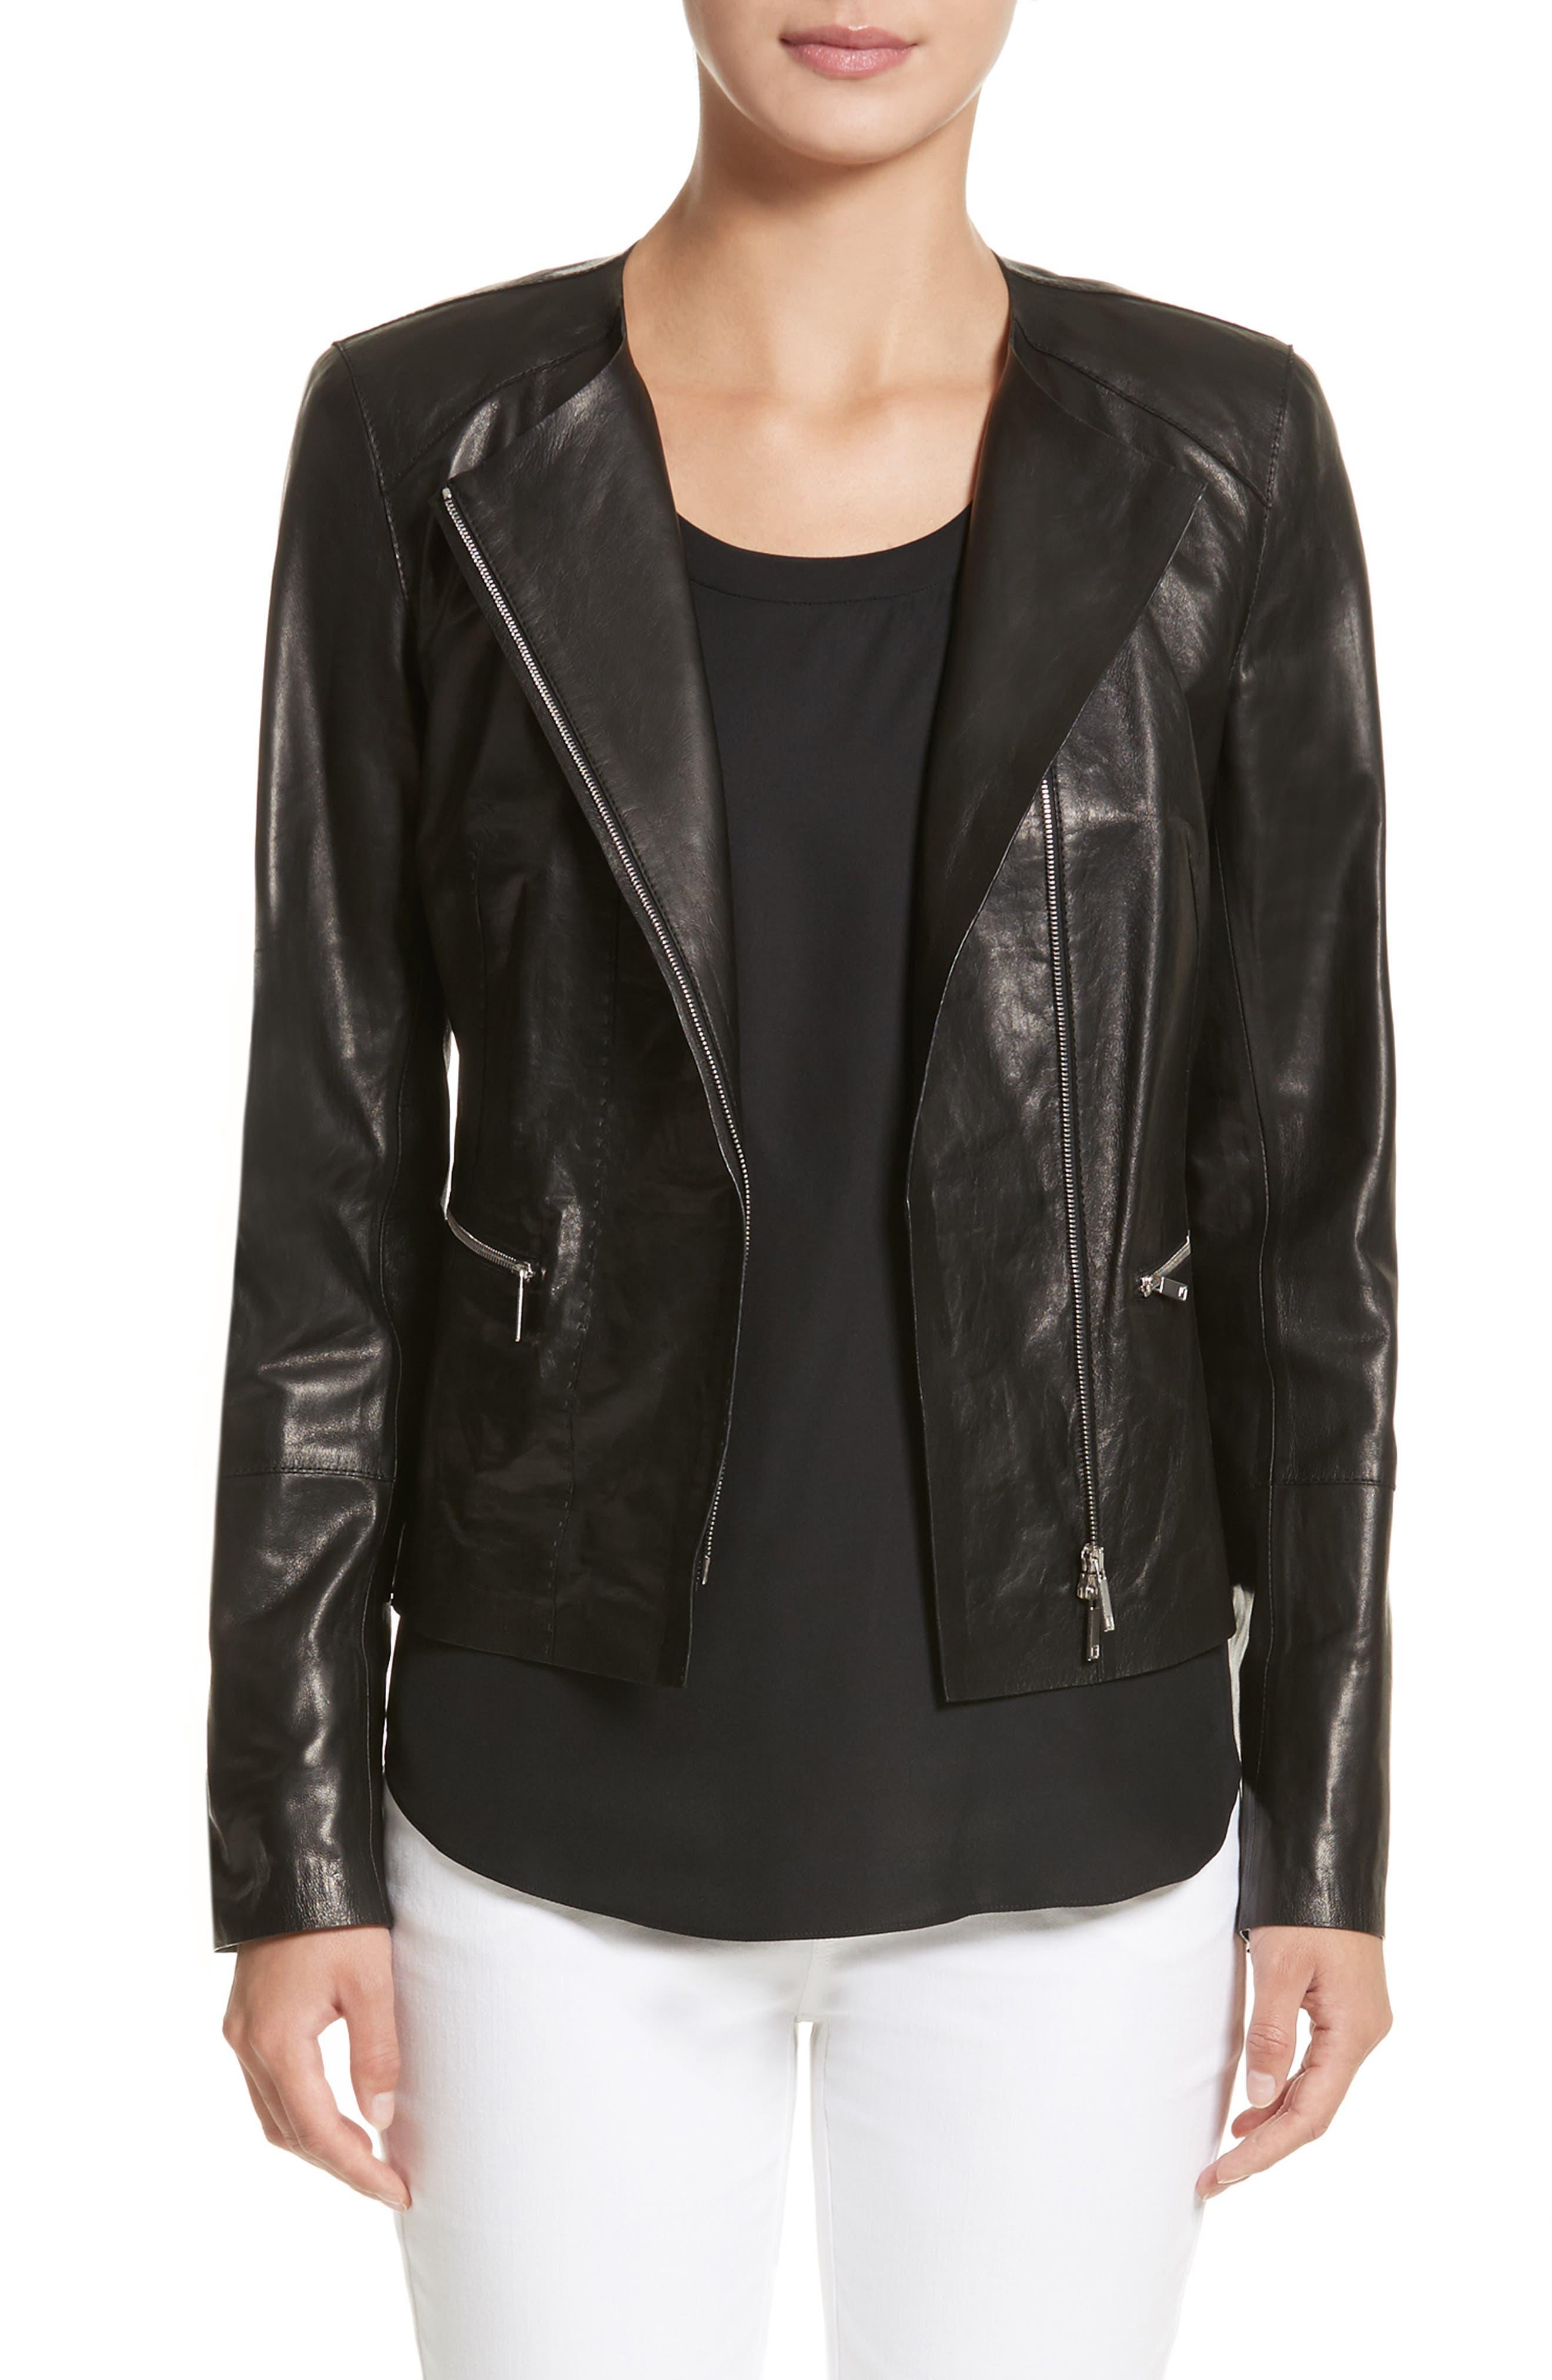 Caridee Glazed Lambskin Leather Jacket,                         Main,                         color, 001